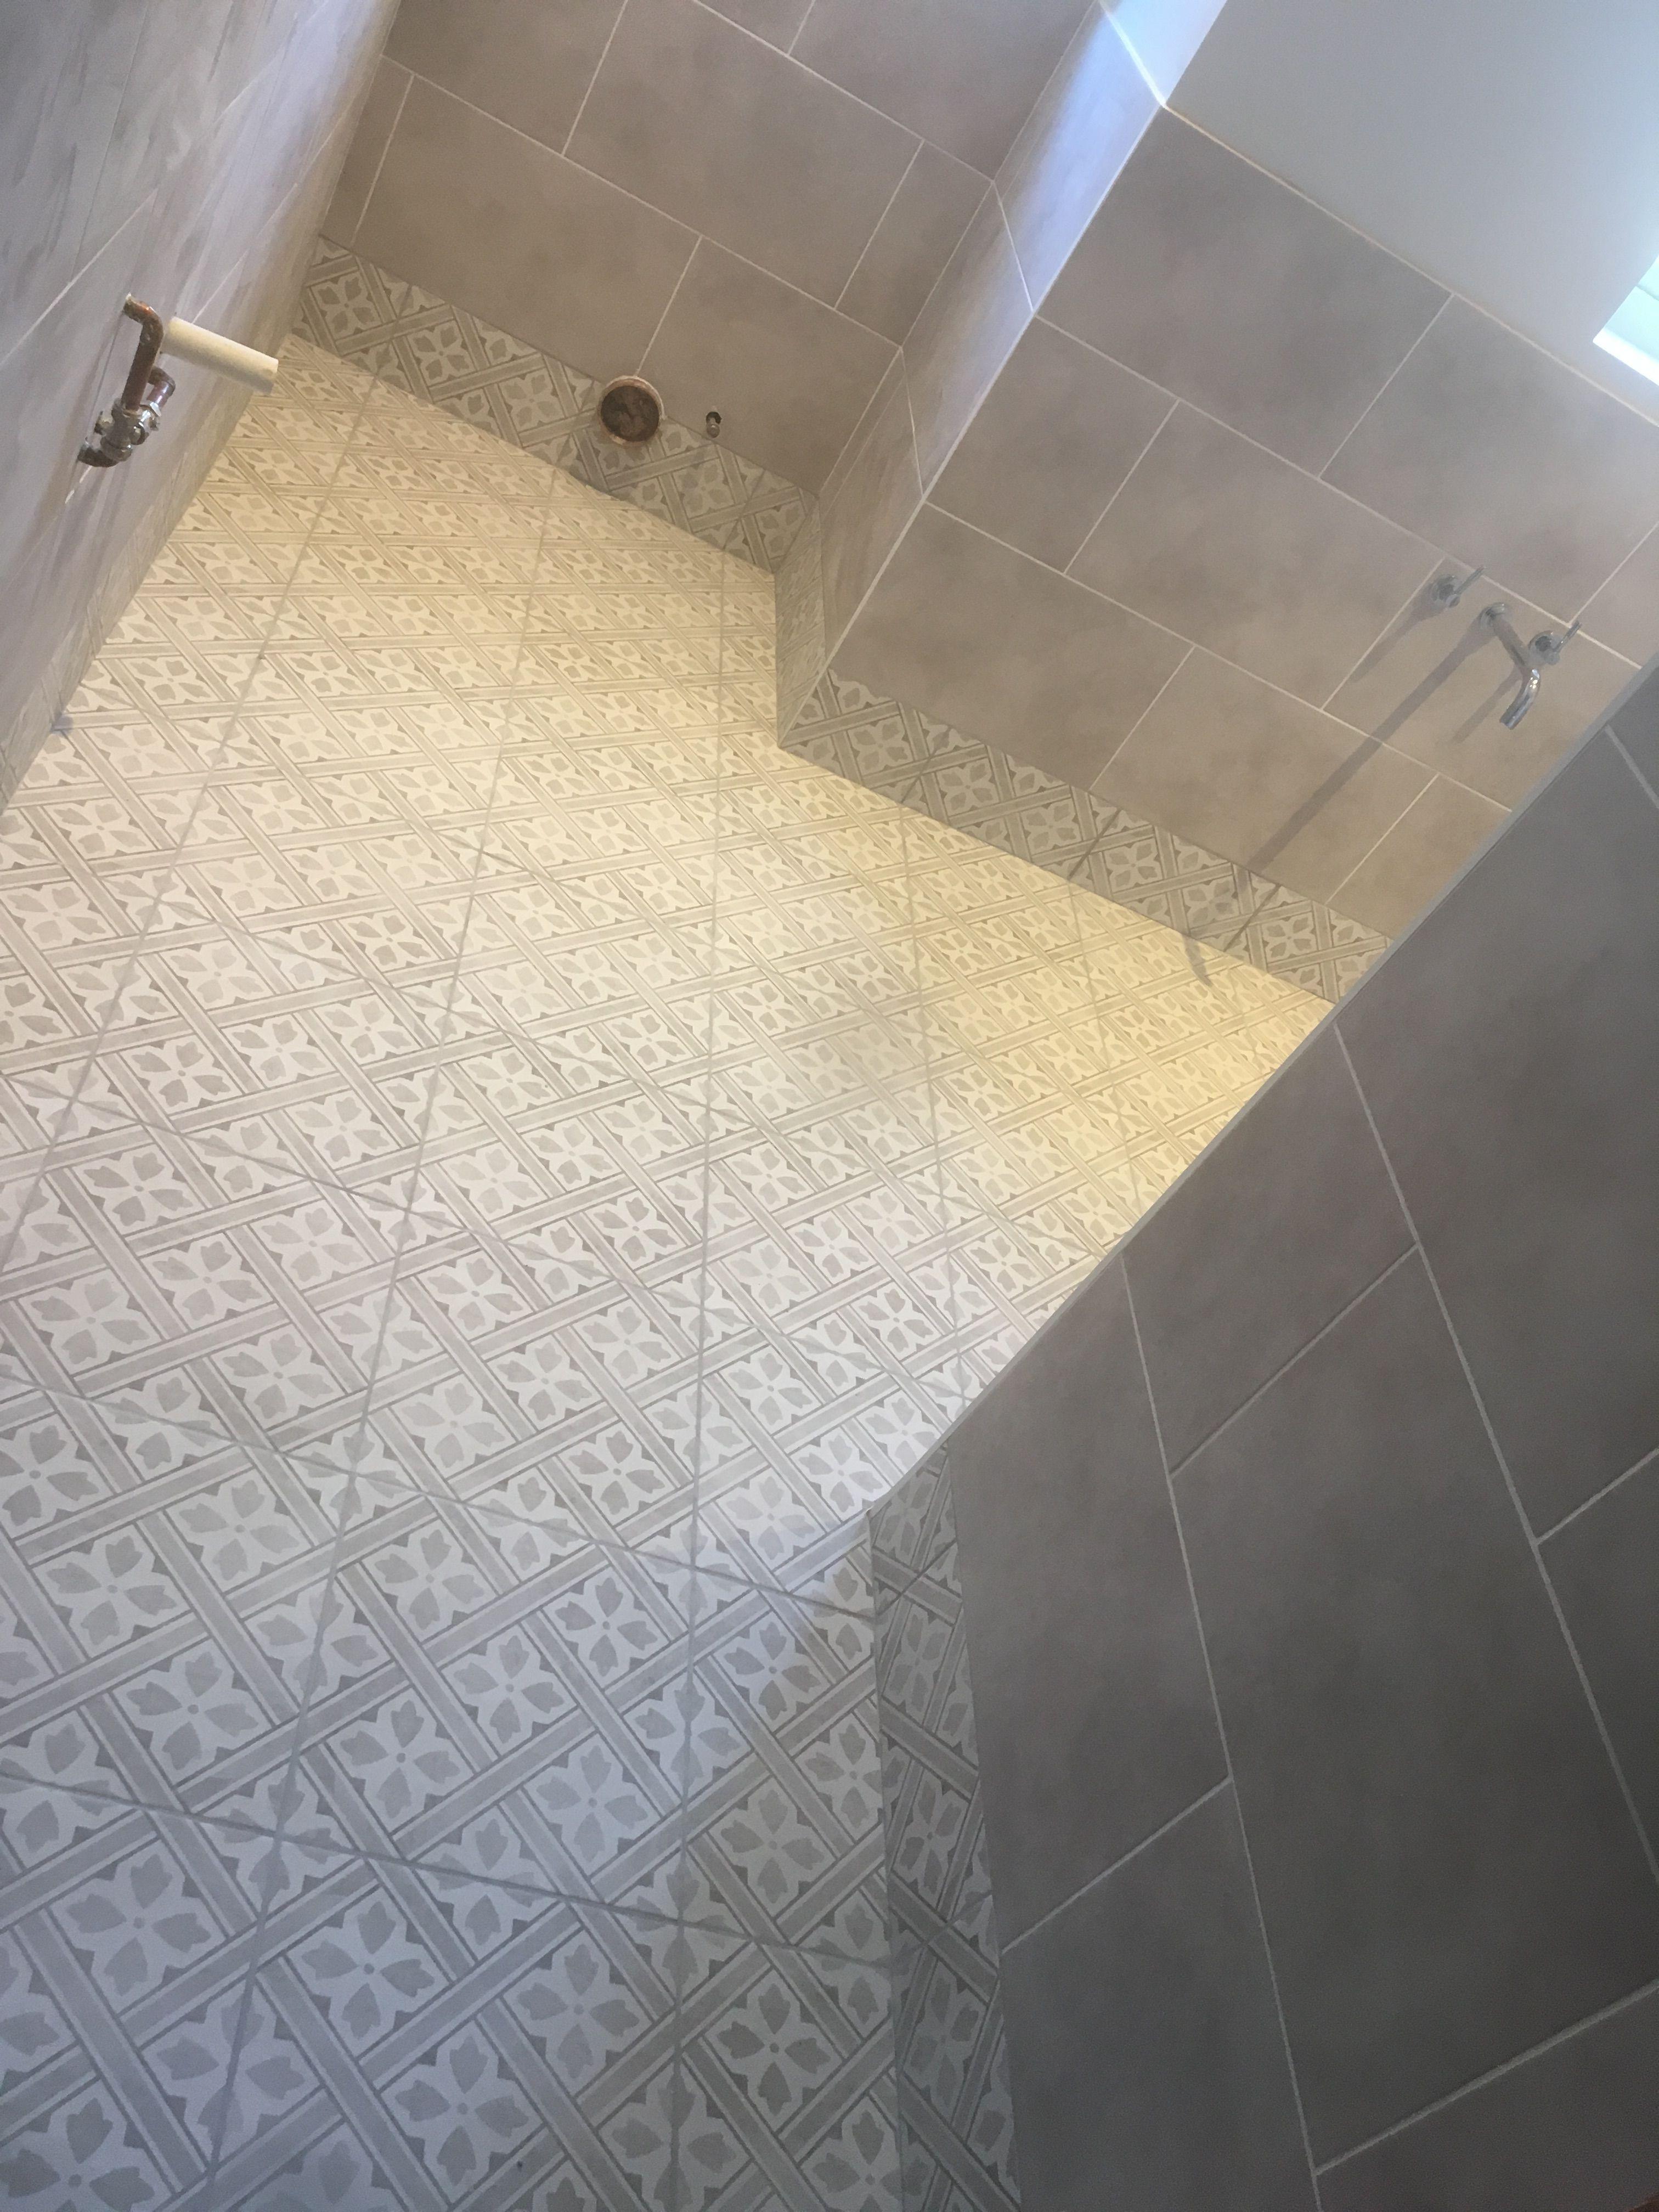 Laura Ashley Mr Jones Dove Grey Josette Grey Tiles Bathroom Shower Freestanding Bath T Laura Ashley Bathroom Tiles Patterned Bathroom Tiles Grey Bathroom Tiles